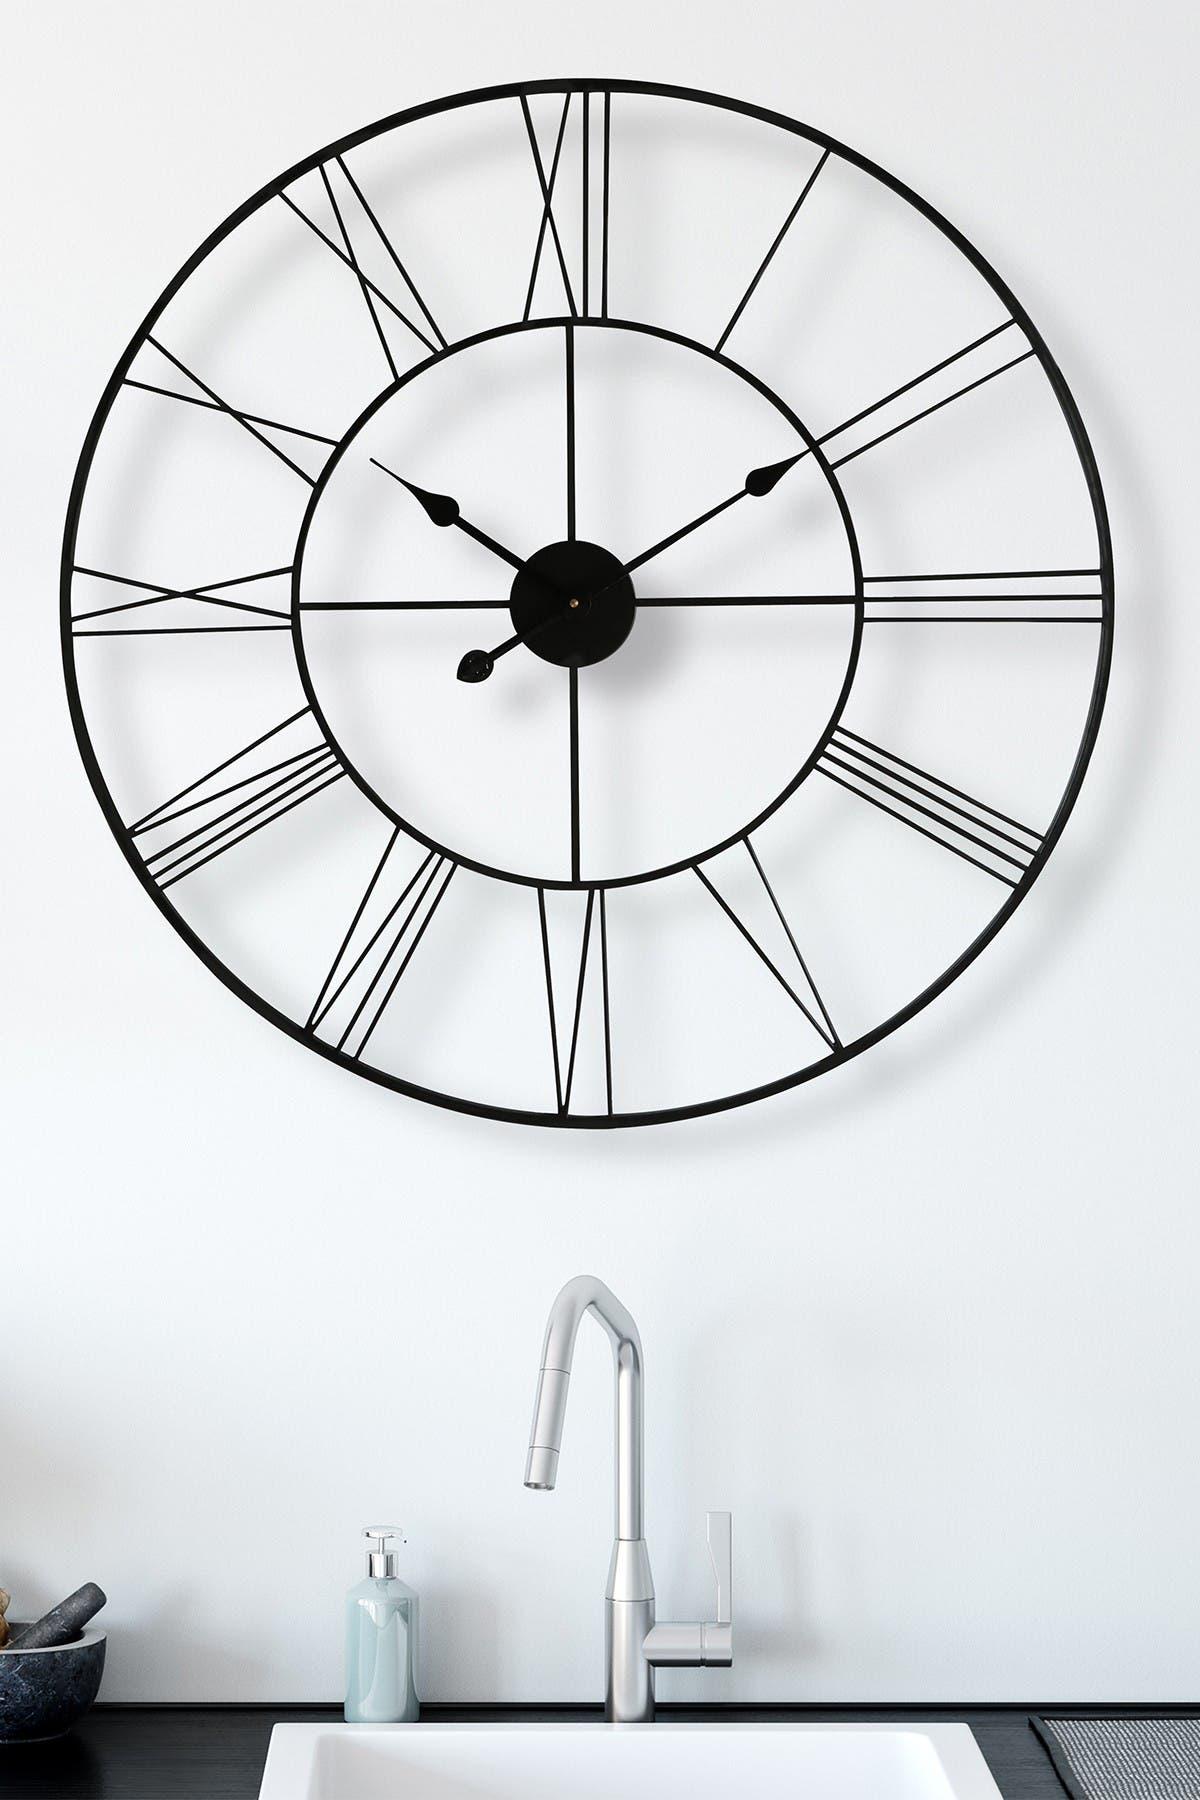 Image of WalPlus Minimalist Slim Iron Wall Clock